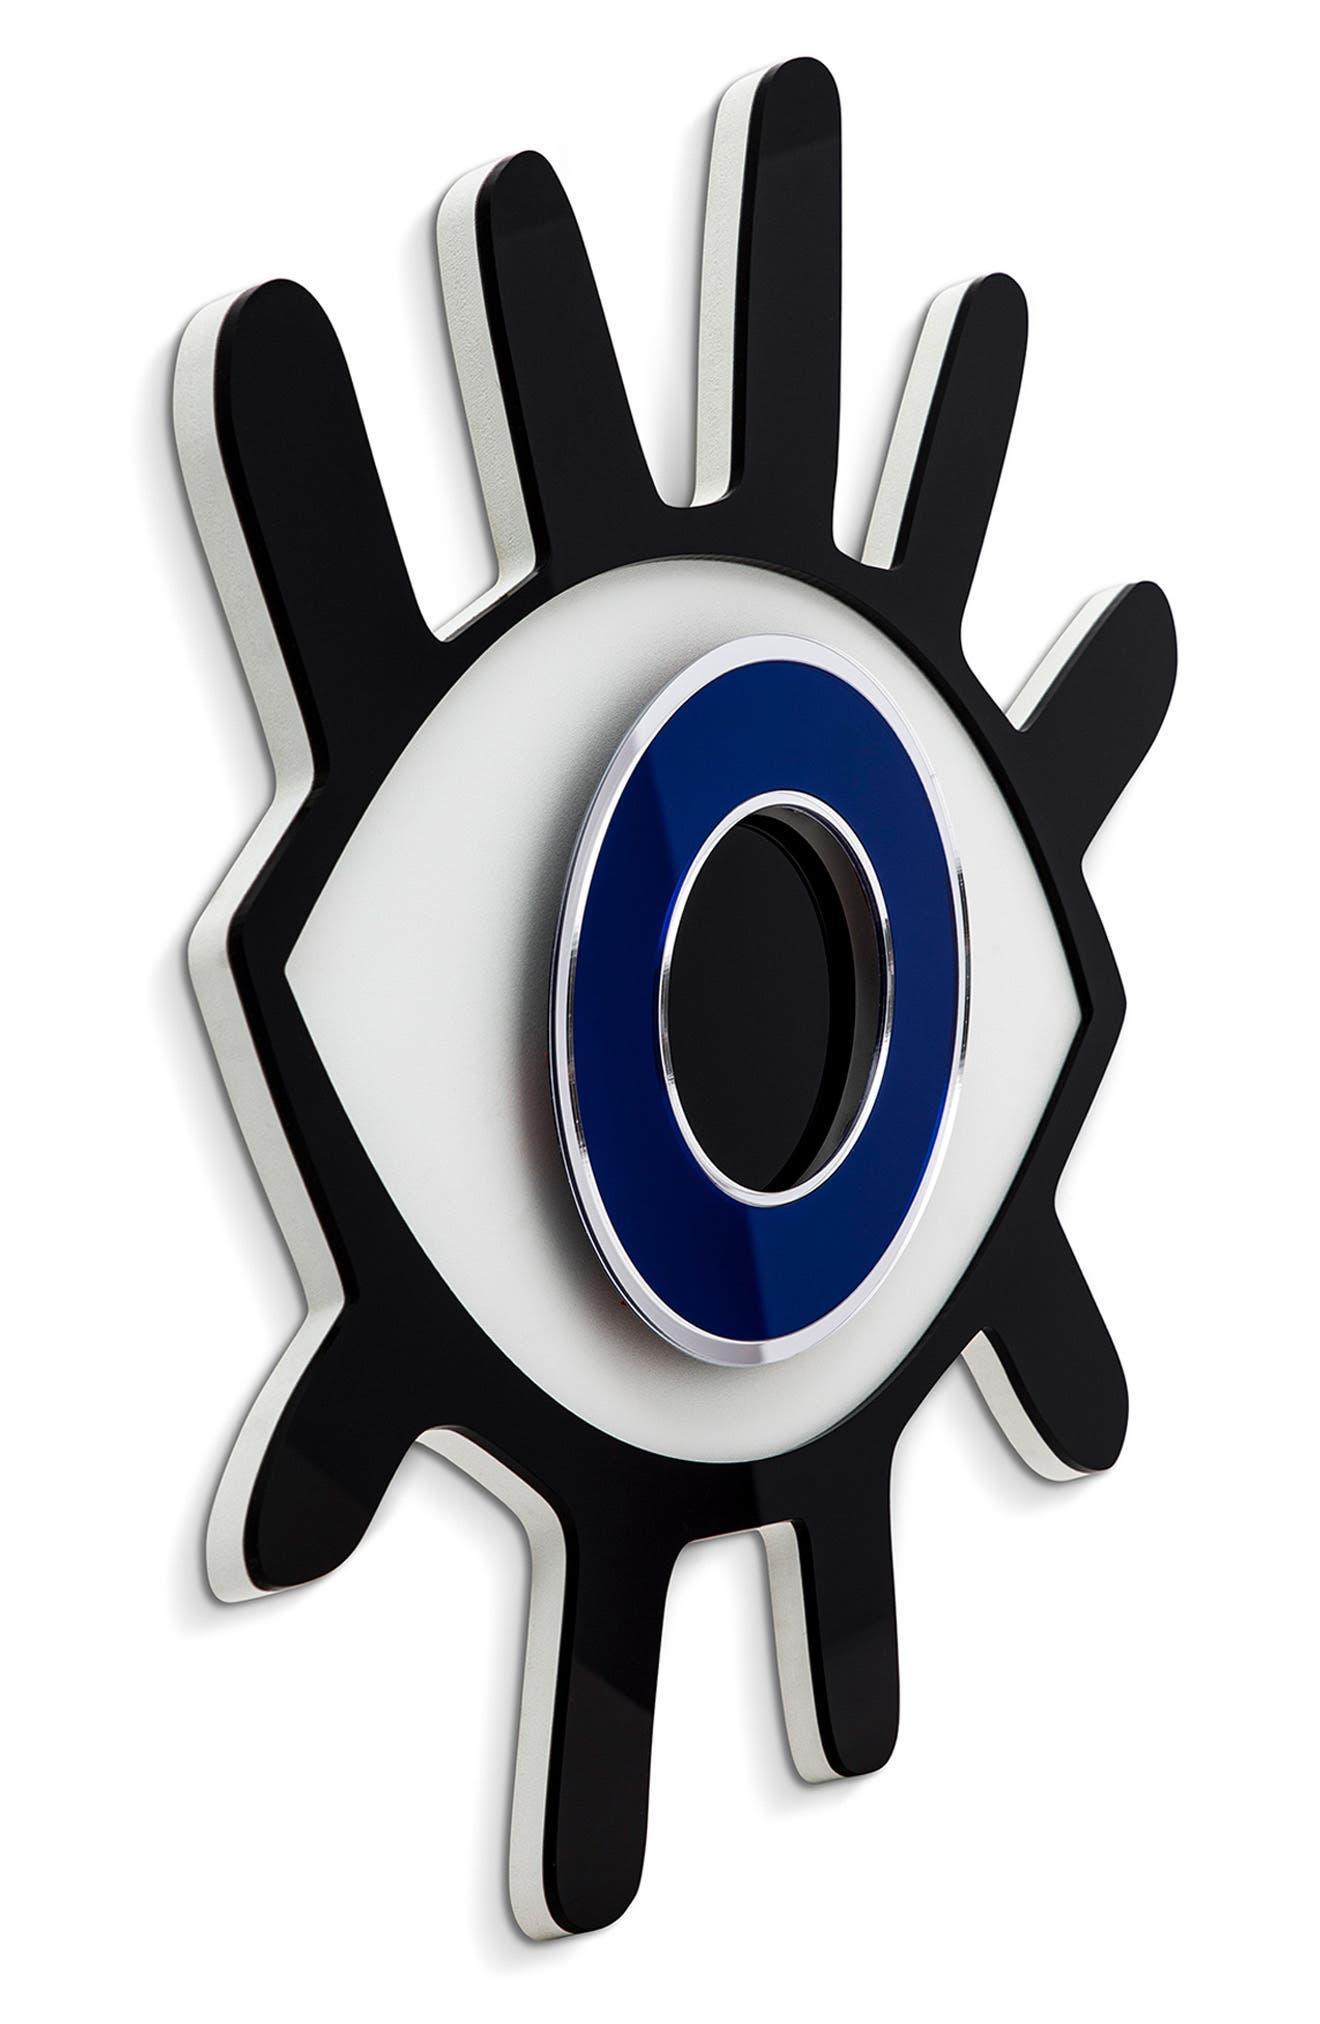 SECTIS DESIGN, Lashed Evil Eye Wall Art, Alternate thumbnail 2, color, BLUE BLACK AND WHITE